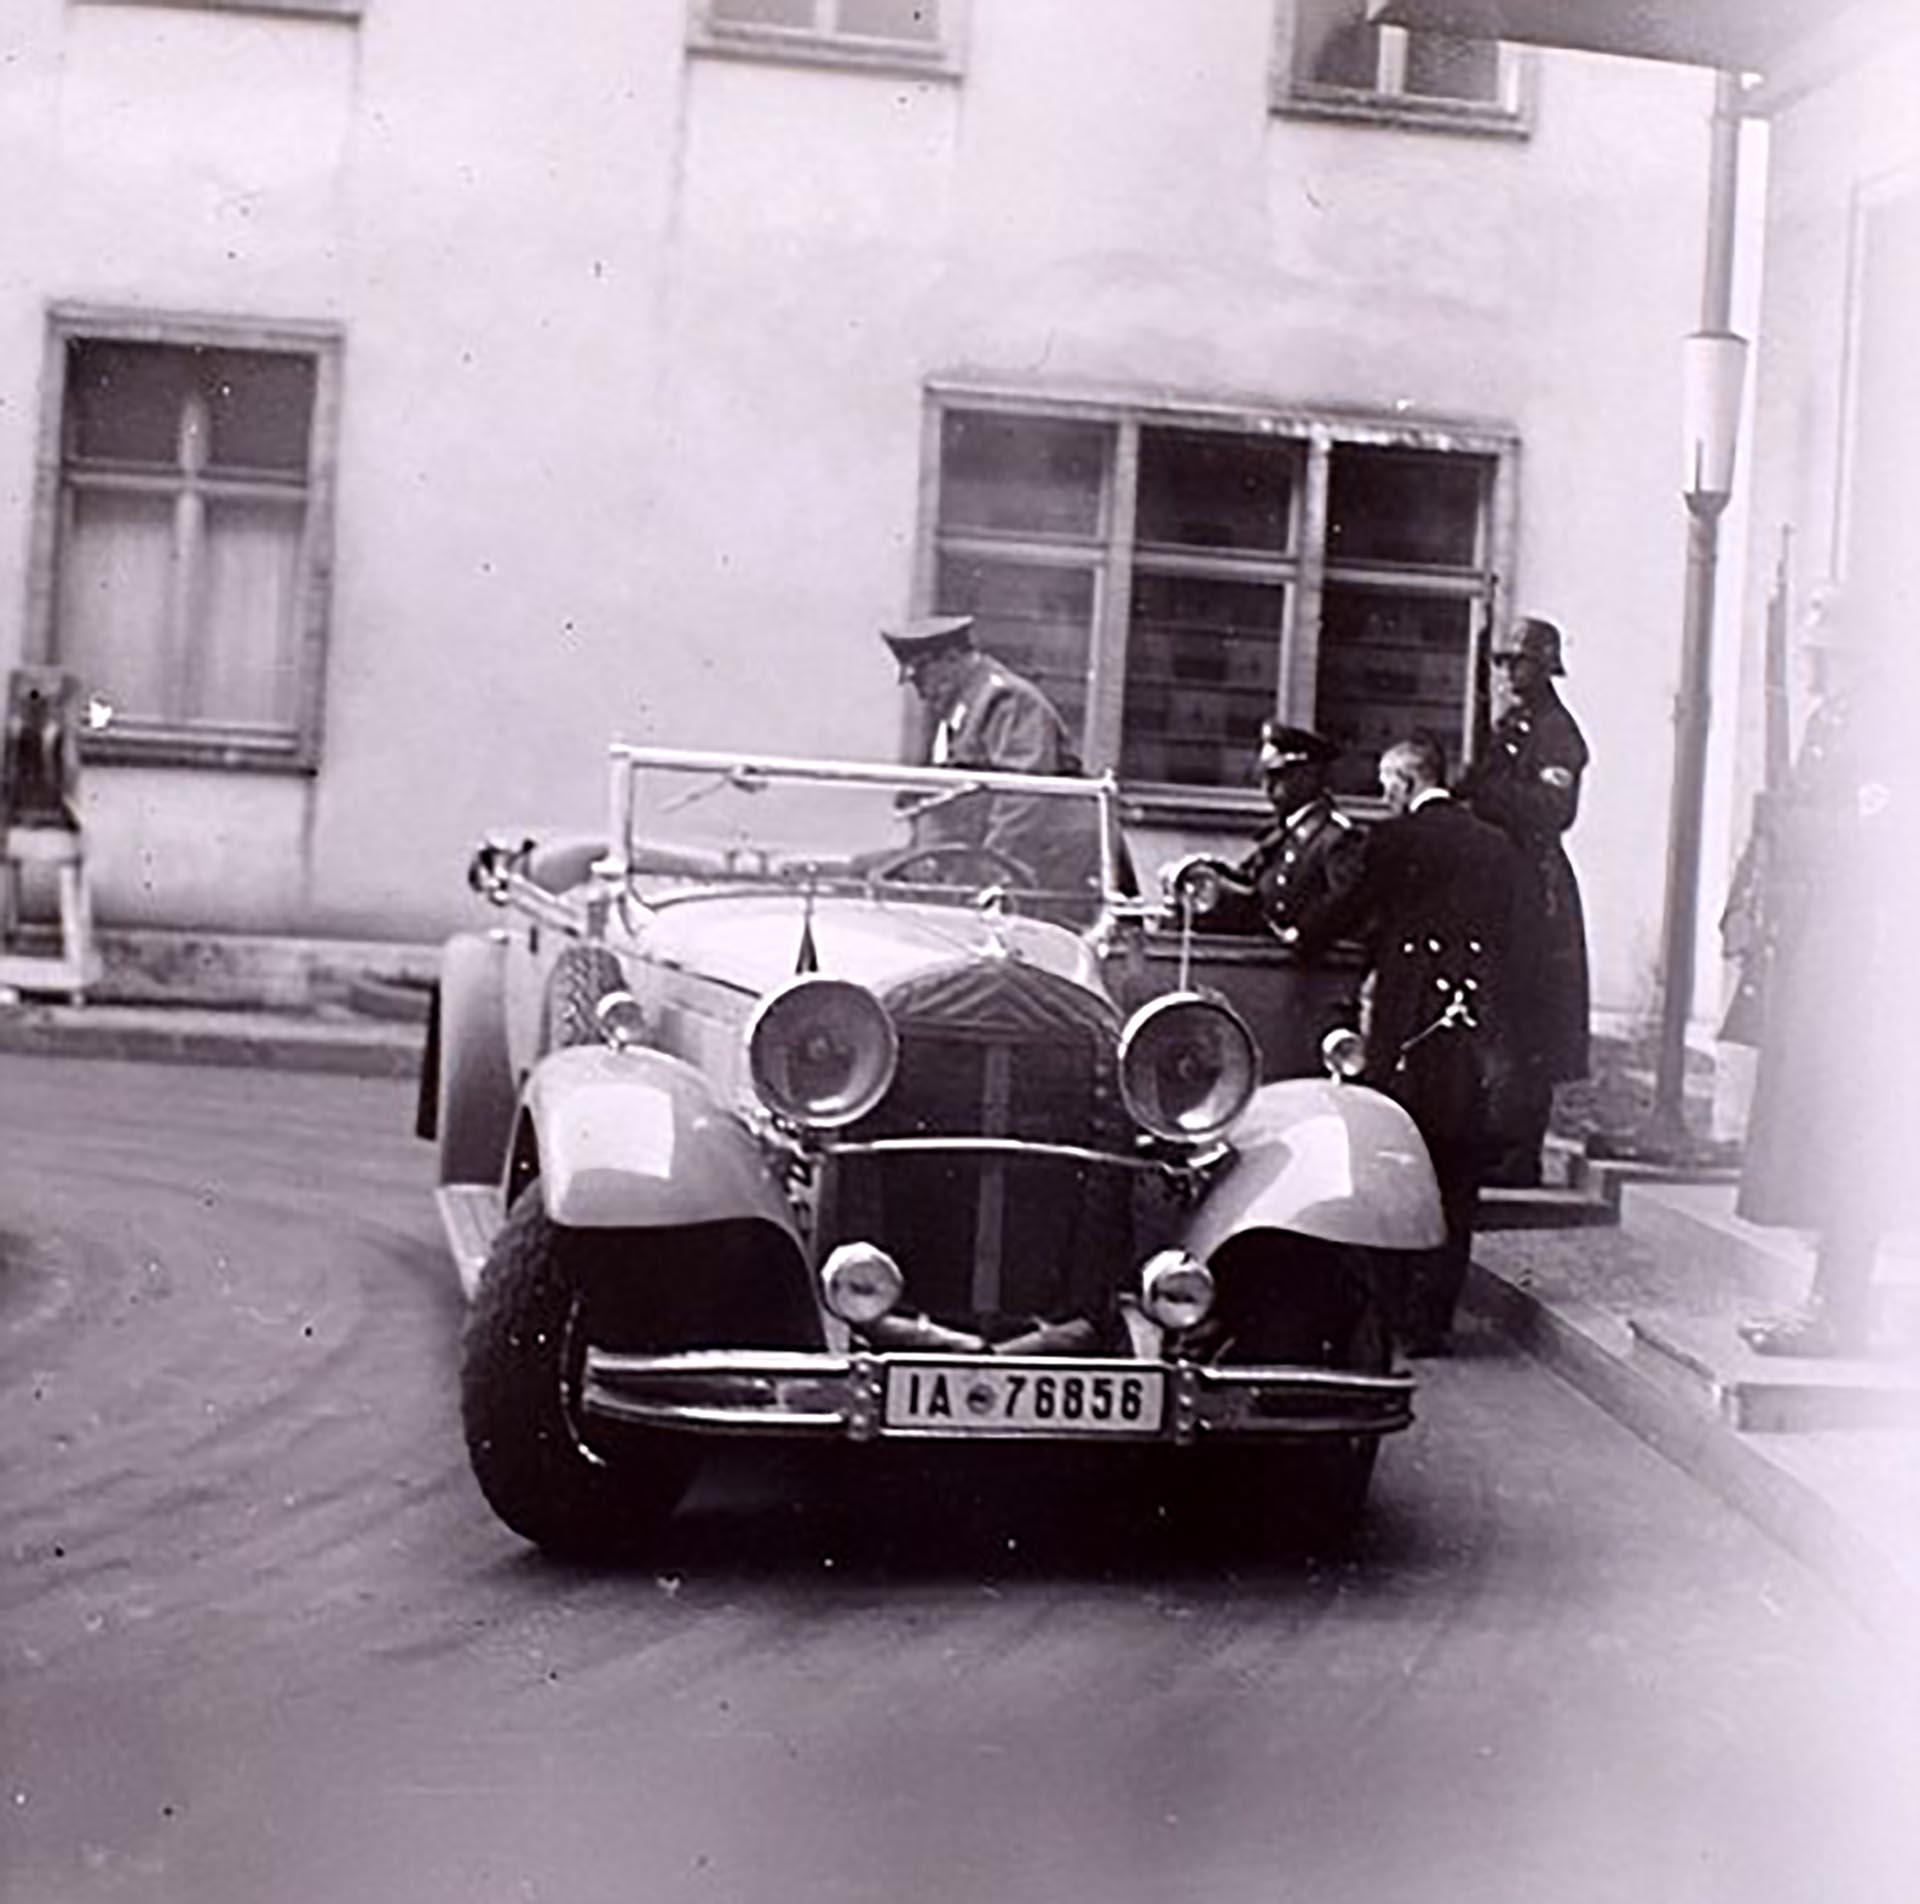 El jefe del Ejército alemán nazi, Hermann Goering, sube a un automóvil